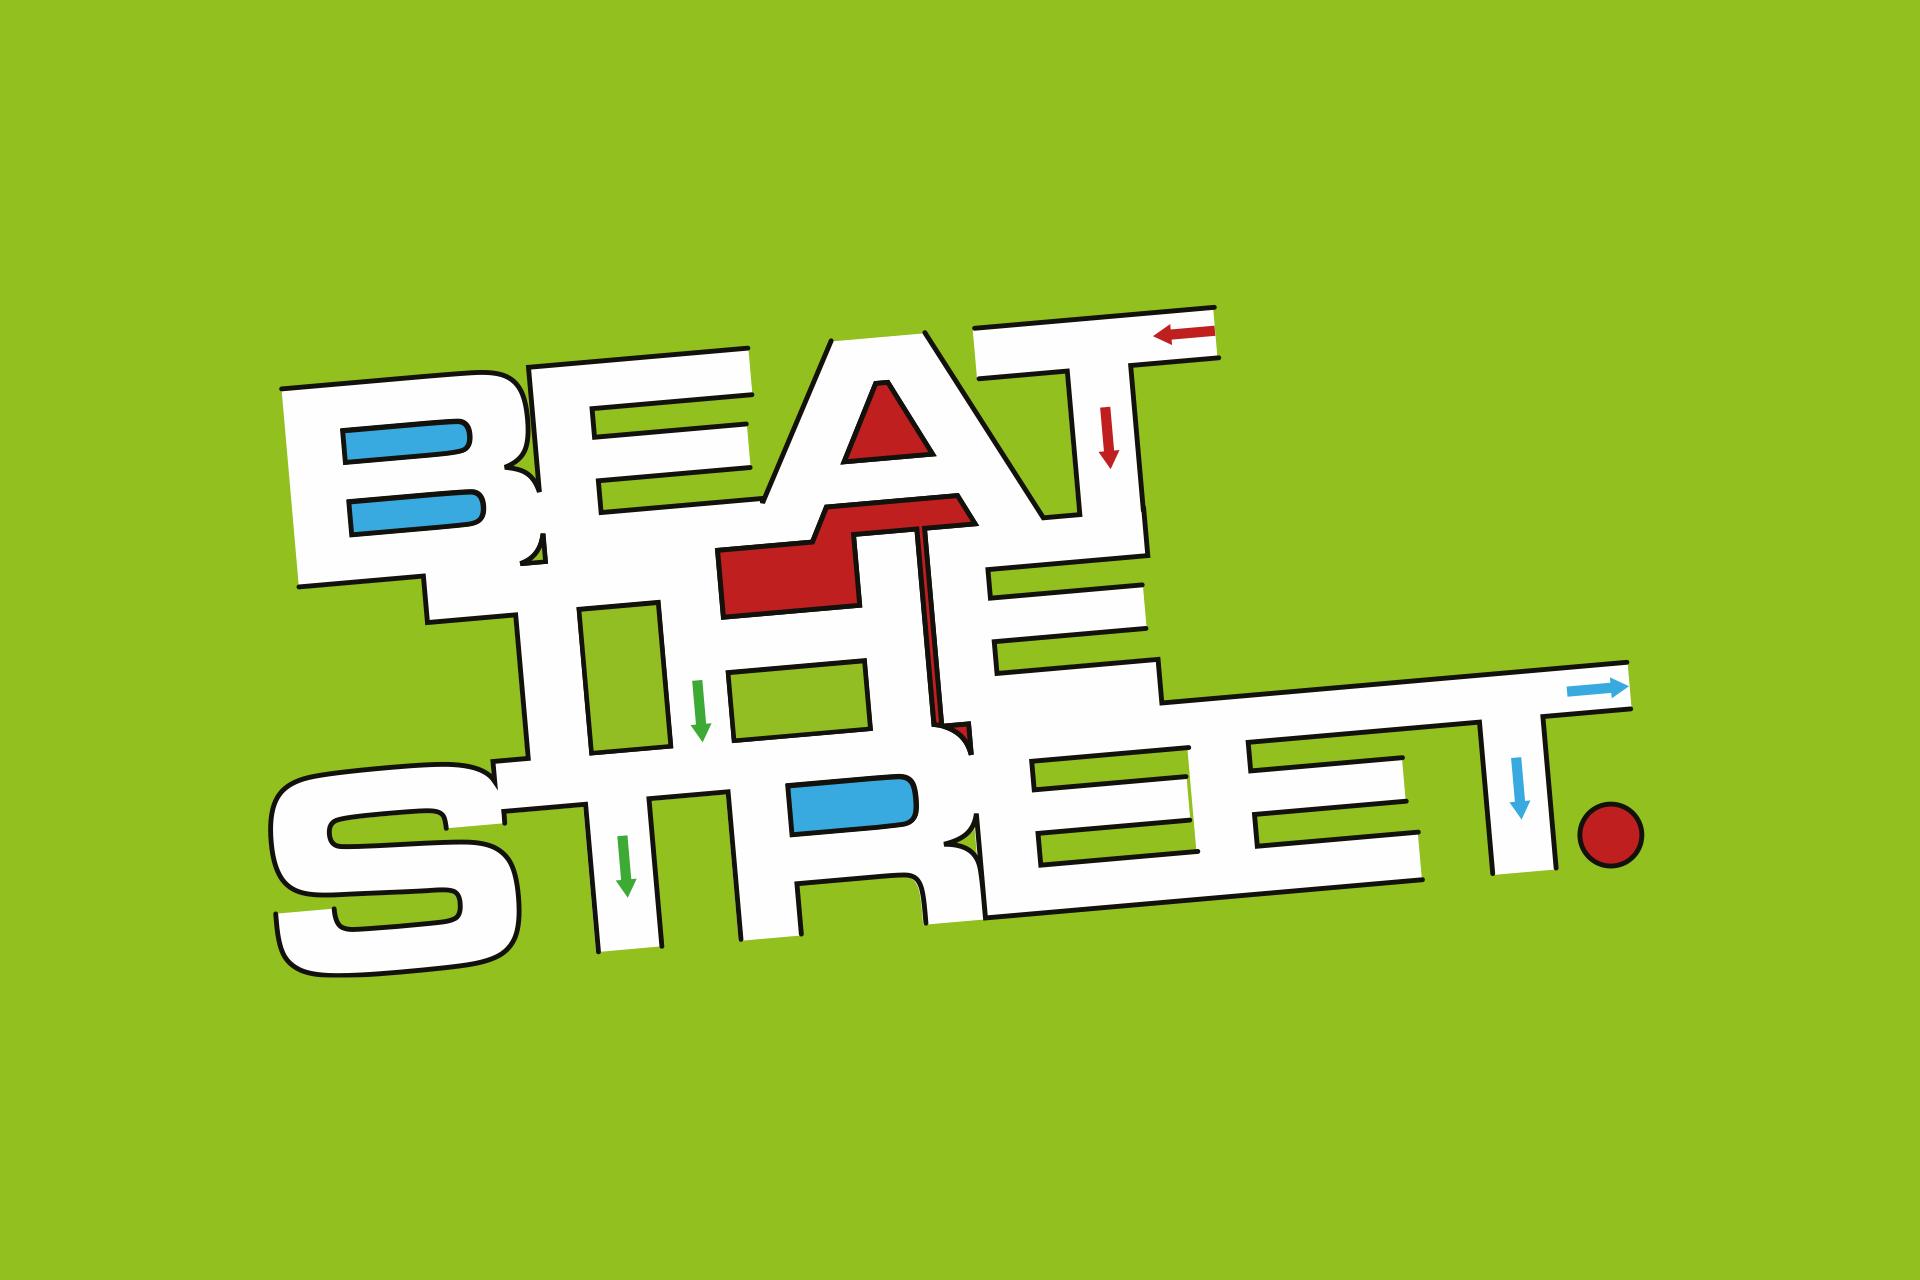 Previous Beat The Street logo